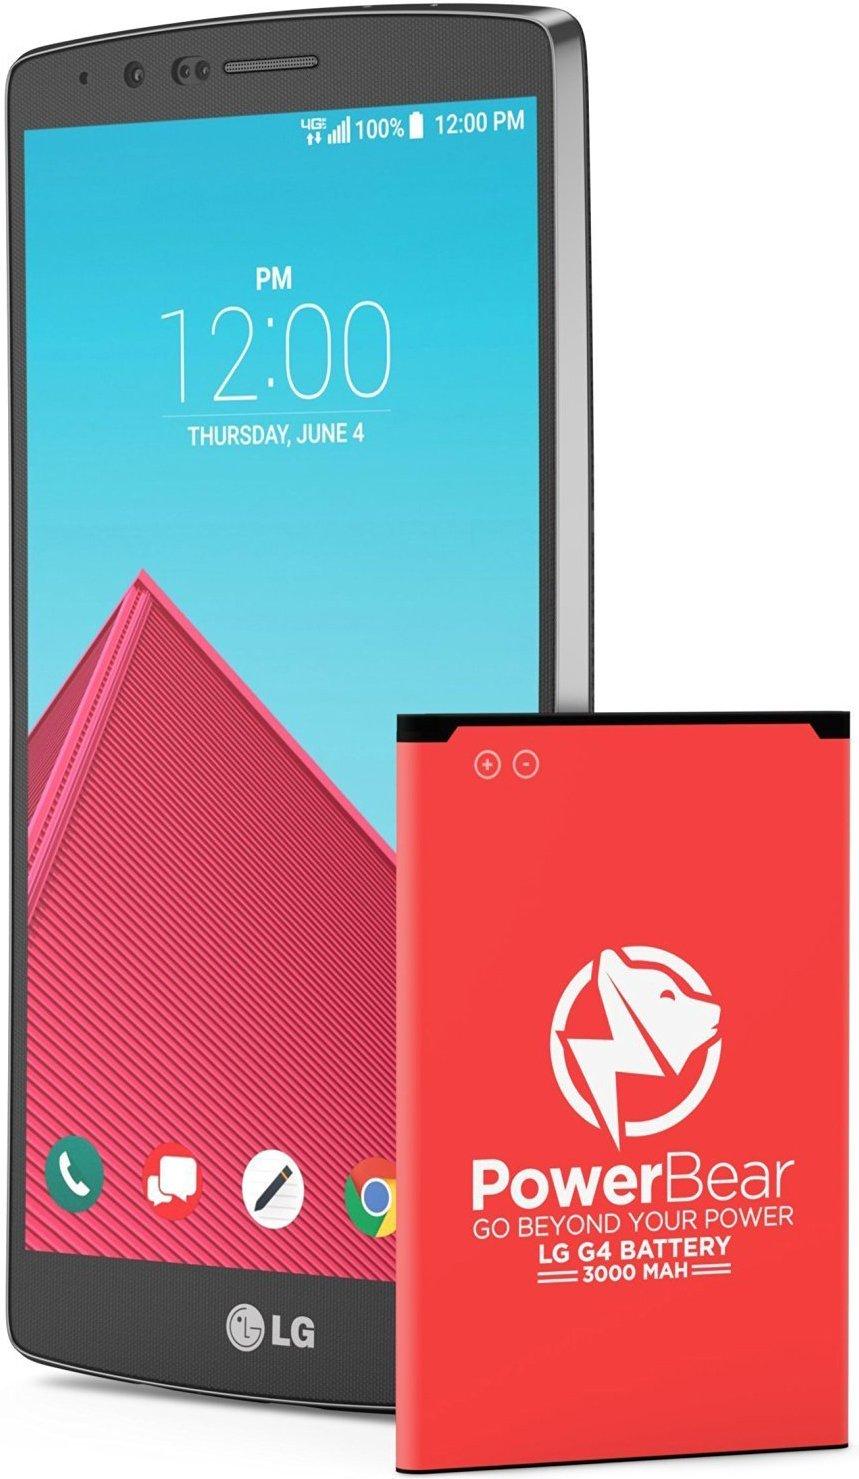 PowerBear LG G4 Battery   3000mAh Li-Ion Battery for the G4 [US991, H812, H815, AT&T H810, T-Mobile H811, Sprint LS991, Verizon VS986]   LGG4 Spare Battery [24 Month Warranty]